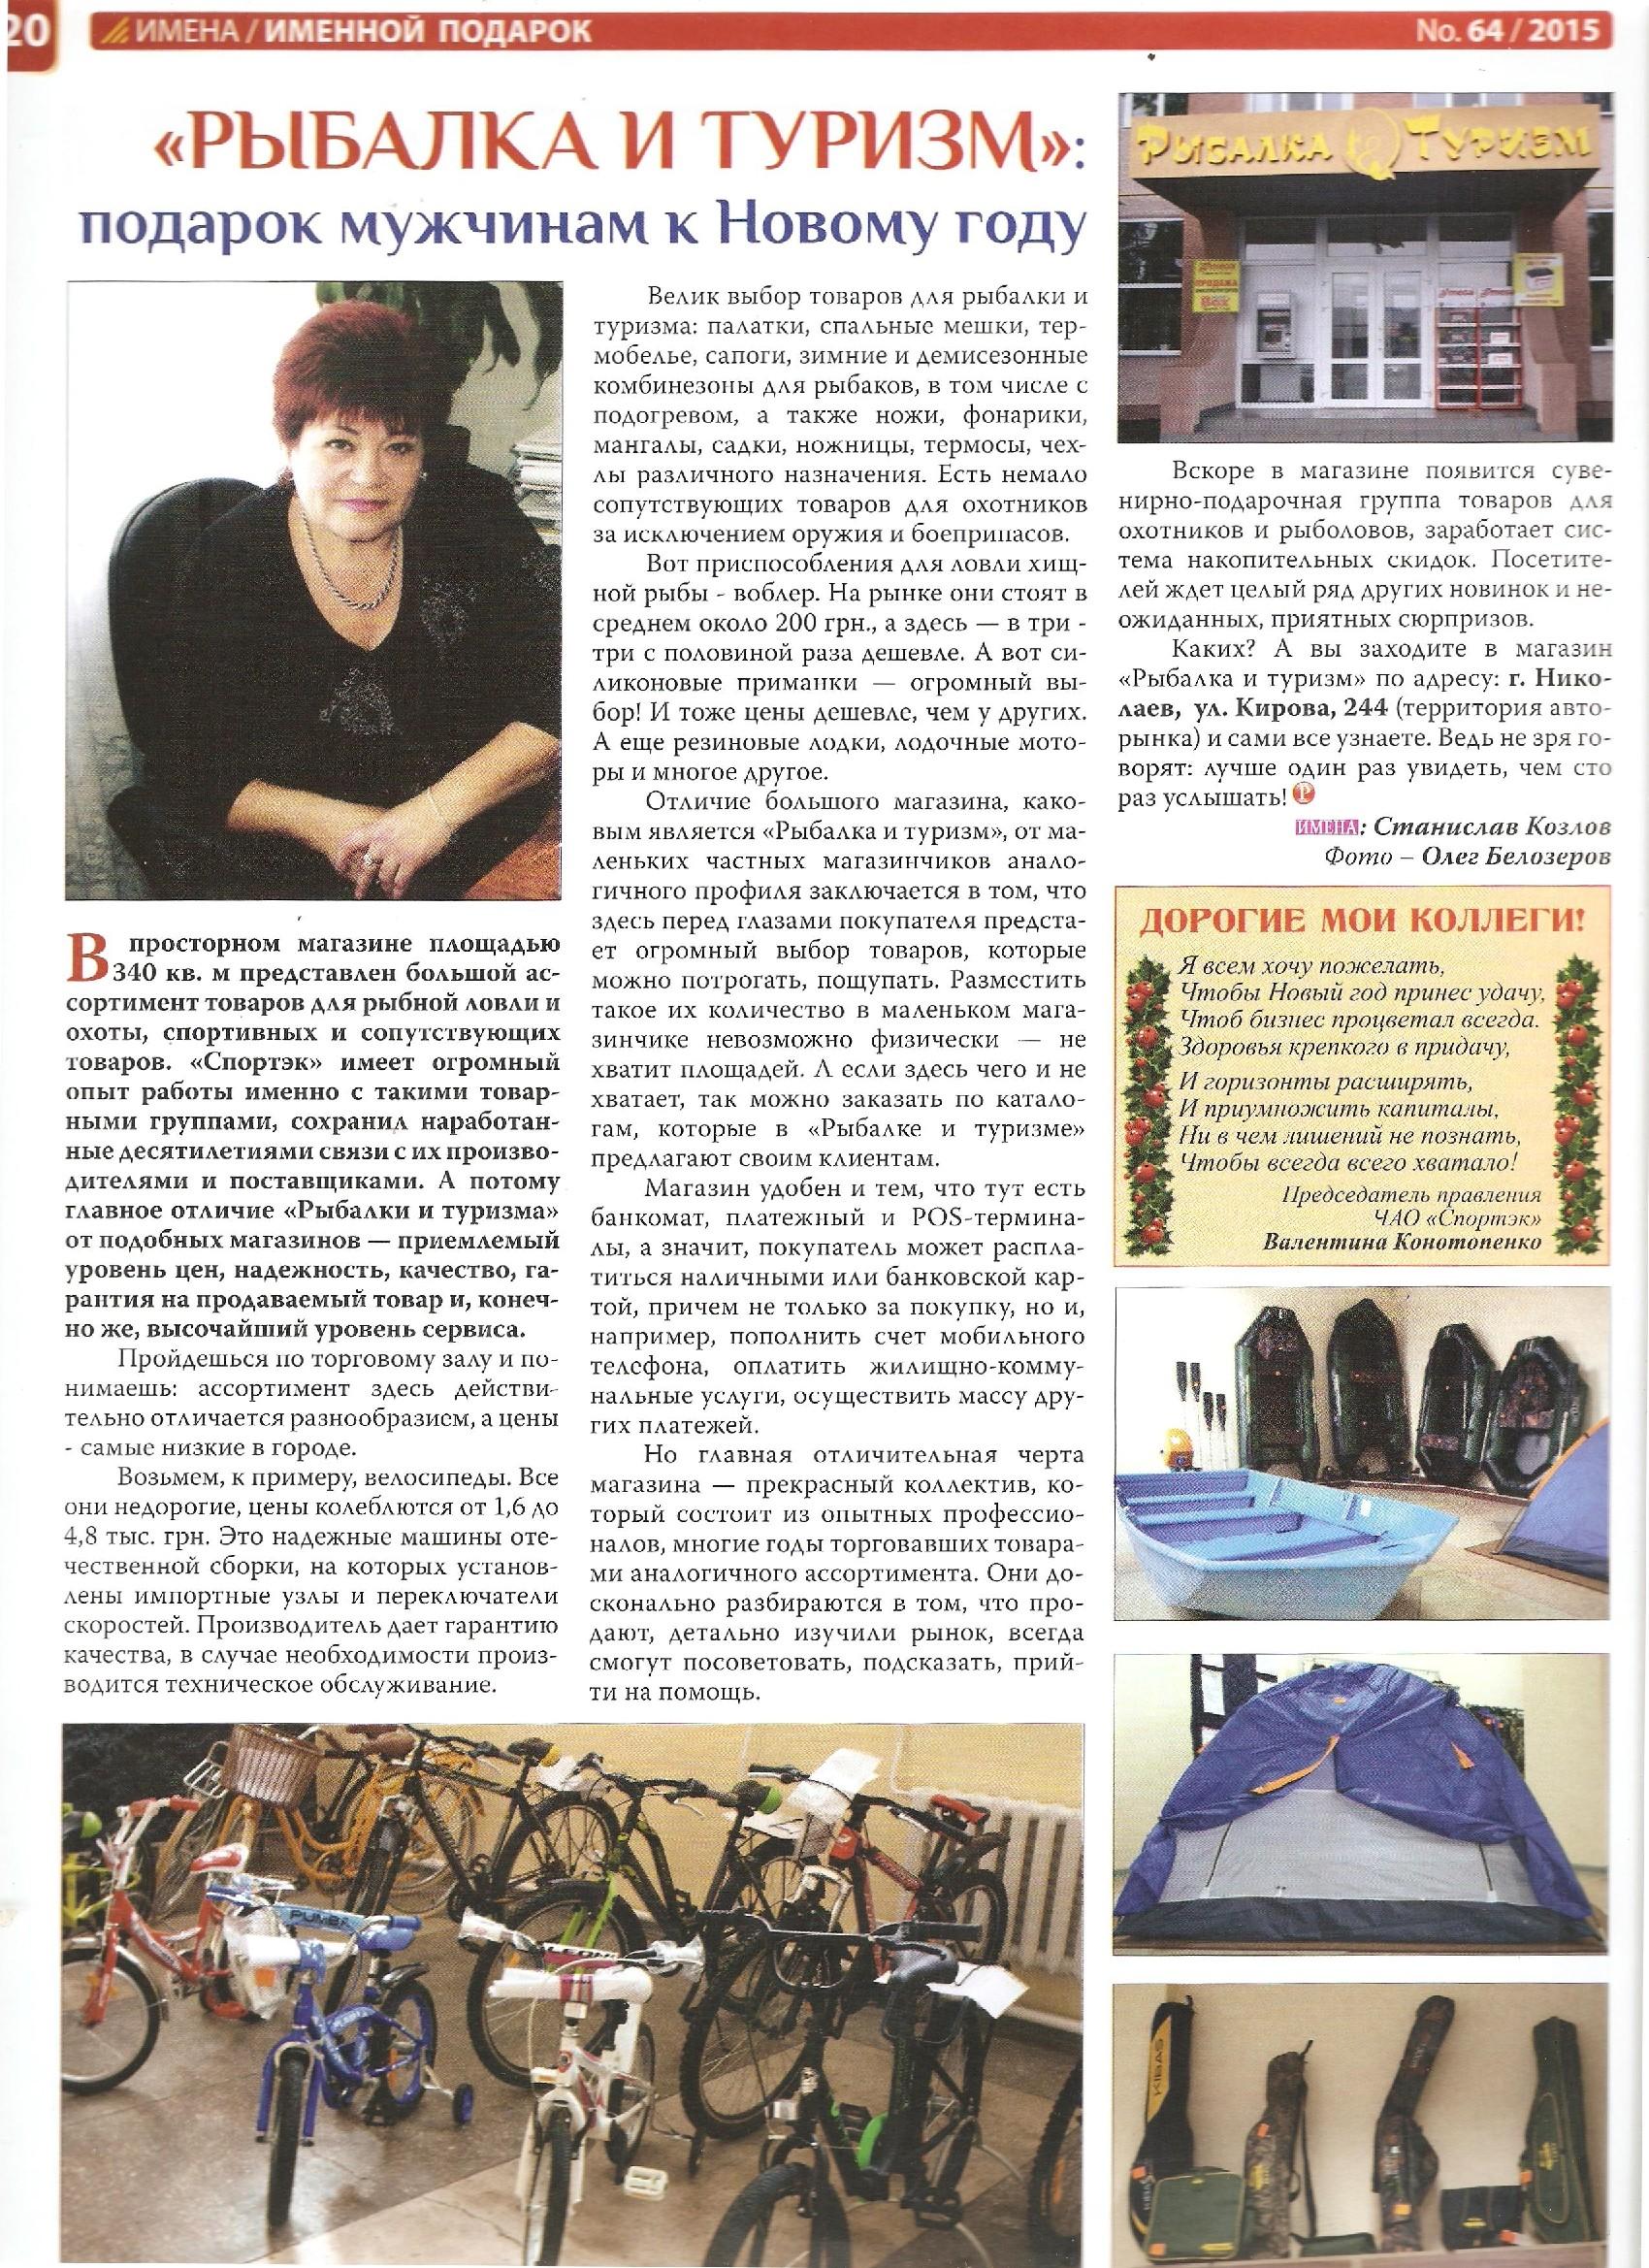 Статья в журнале Имена №64 за 2015 год